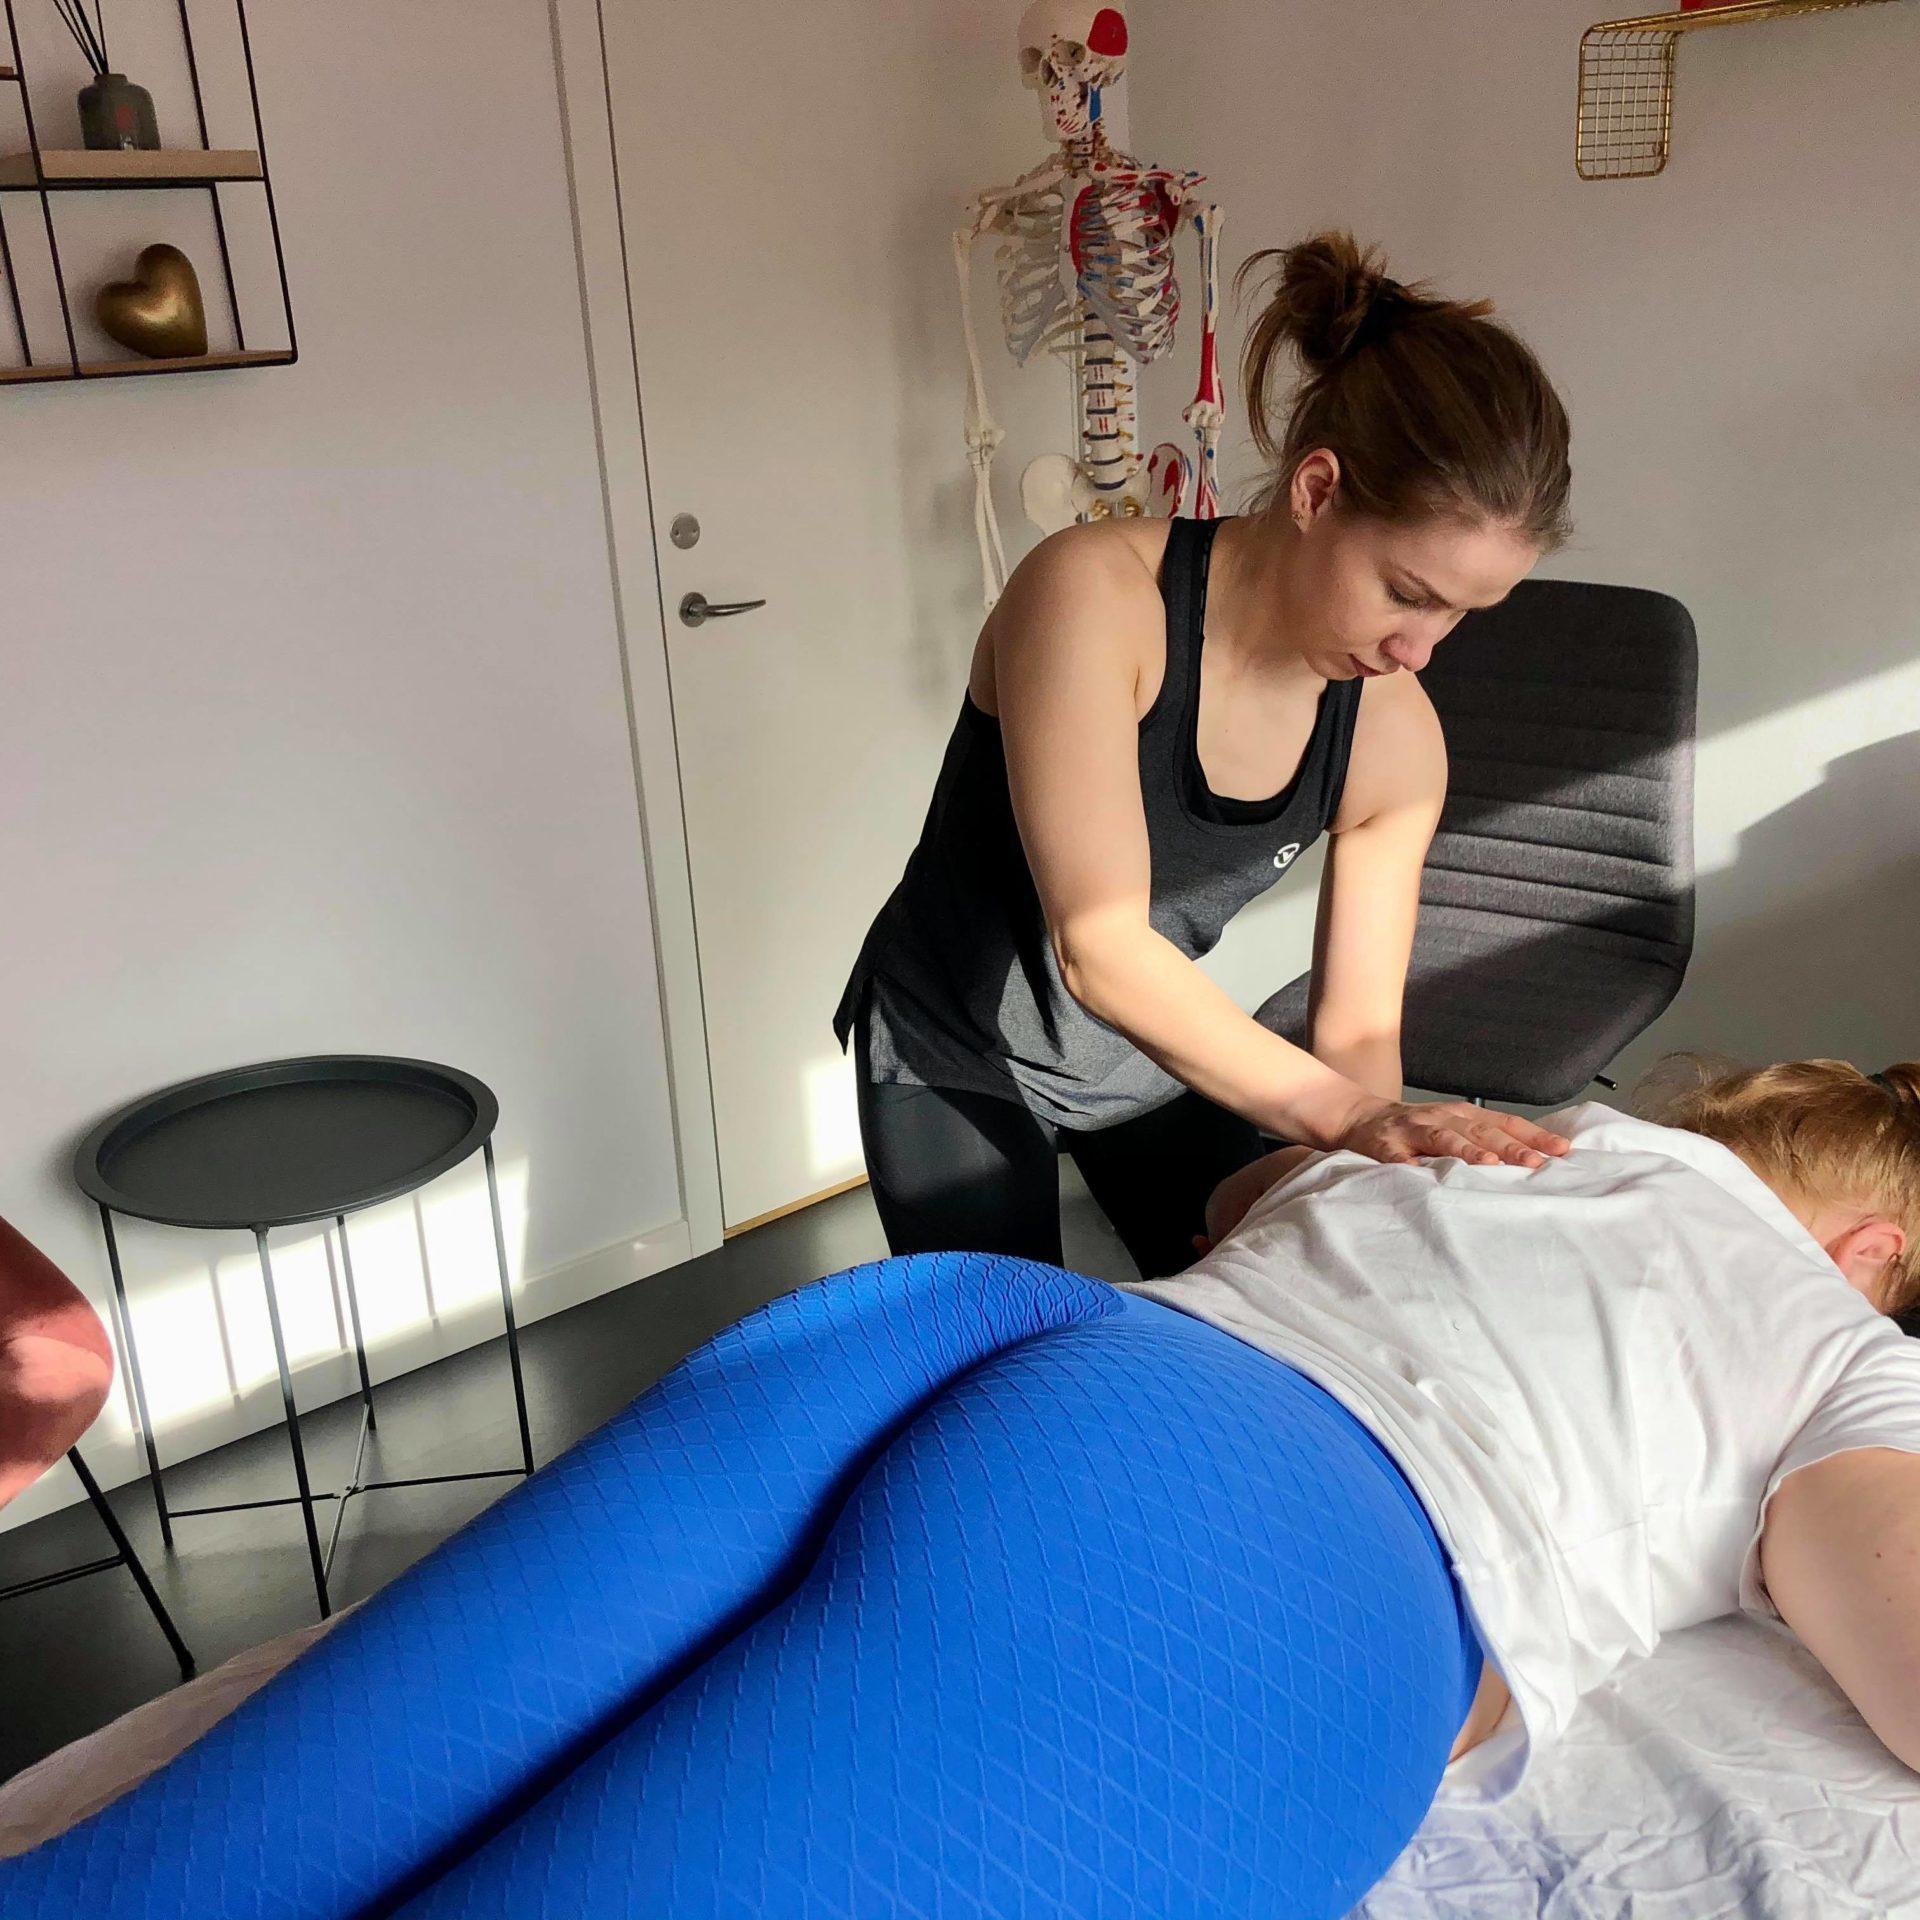 Fysioterapeut Vanløse, Improve Studio, Sofie Ankerstjerne4